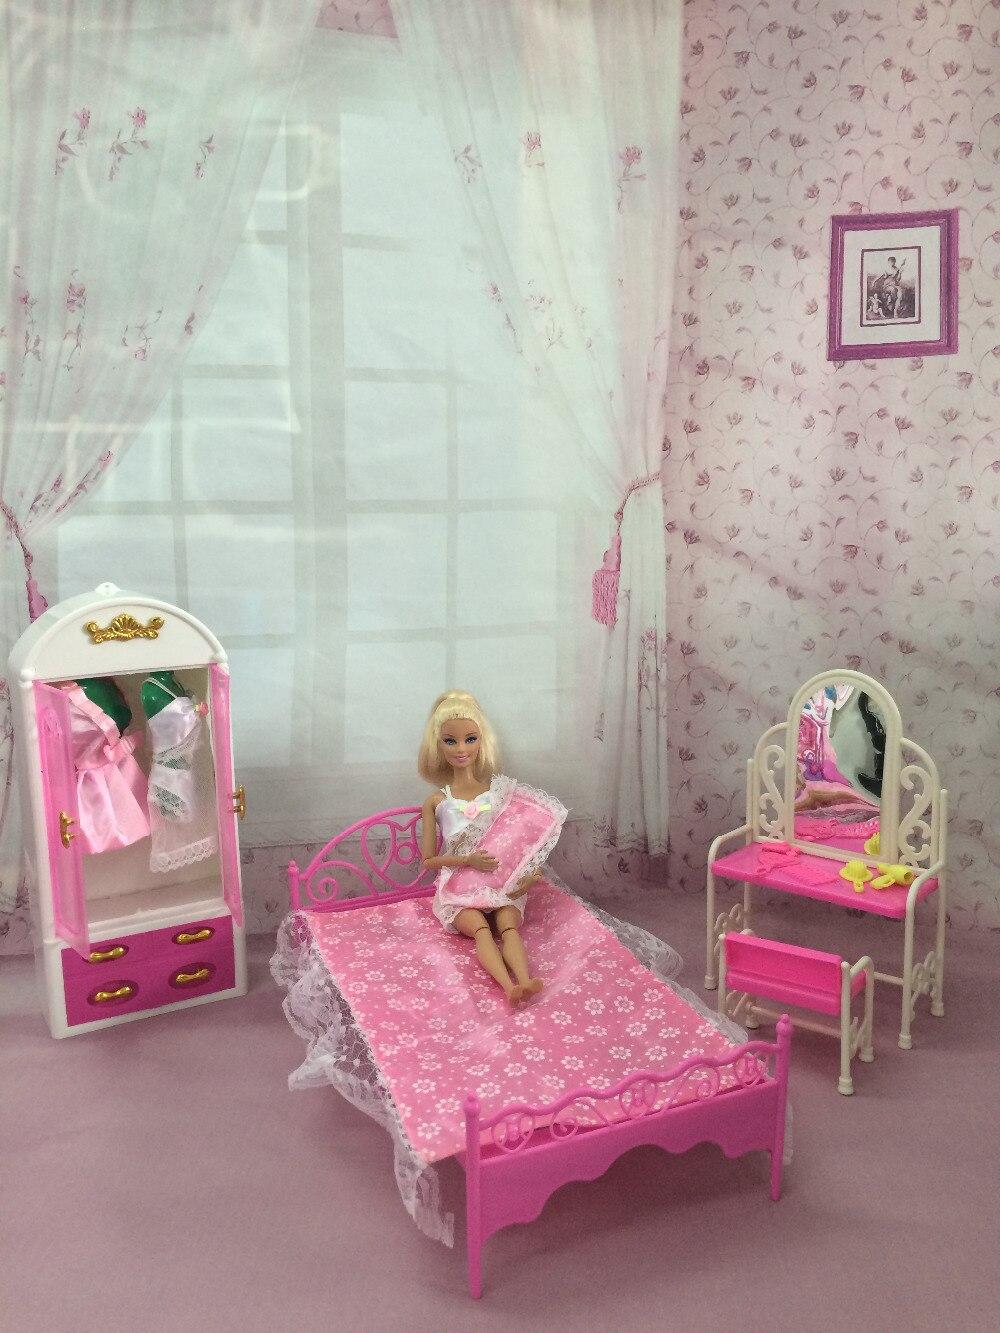 Acquista all 39 ingrosso online barbie guardaroba da for Accessori per barbie